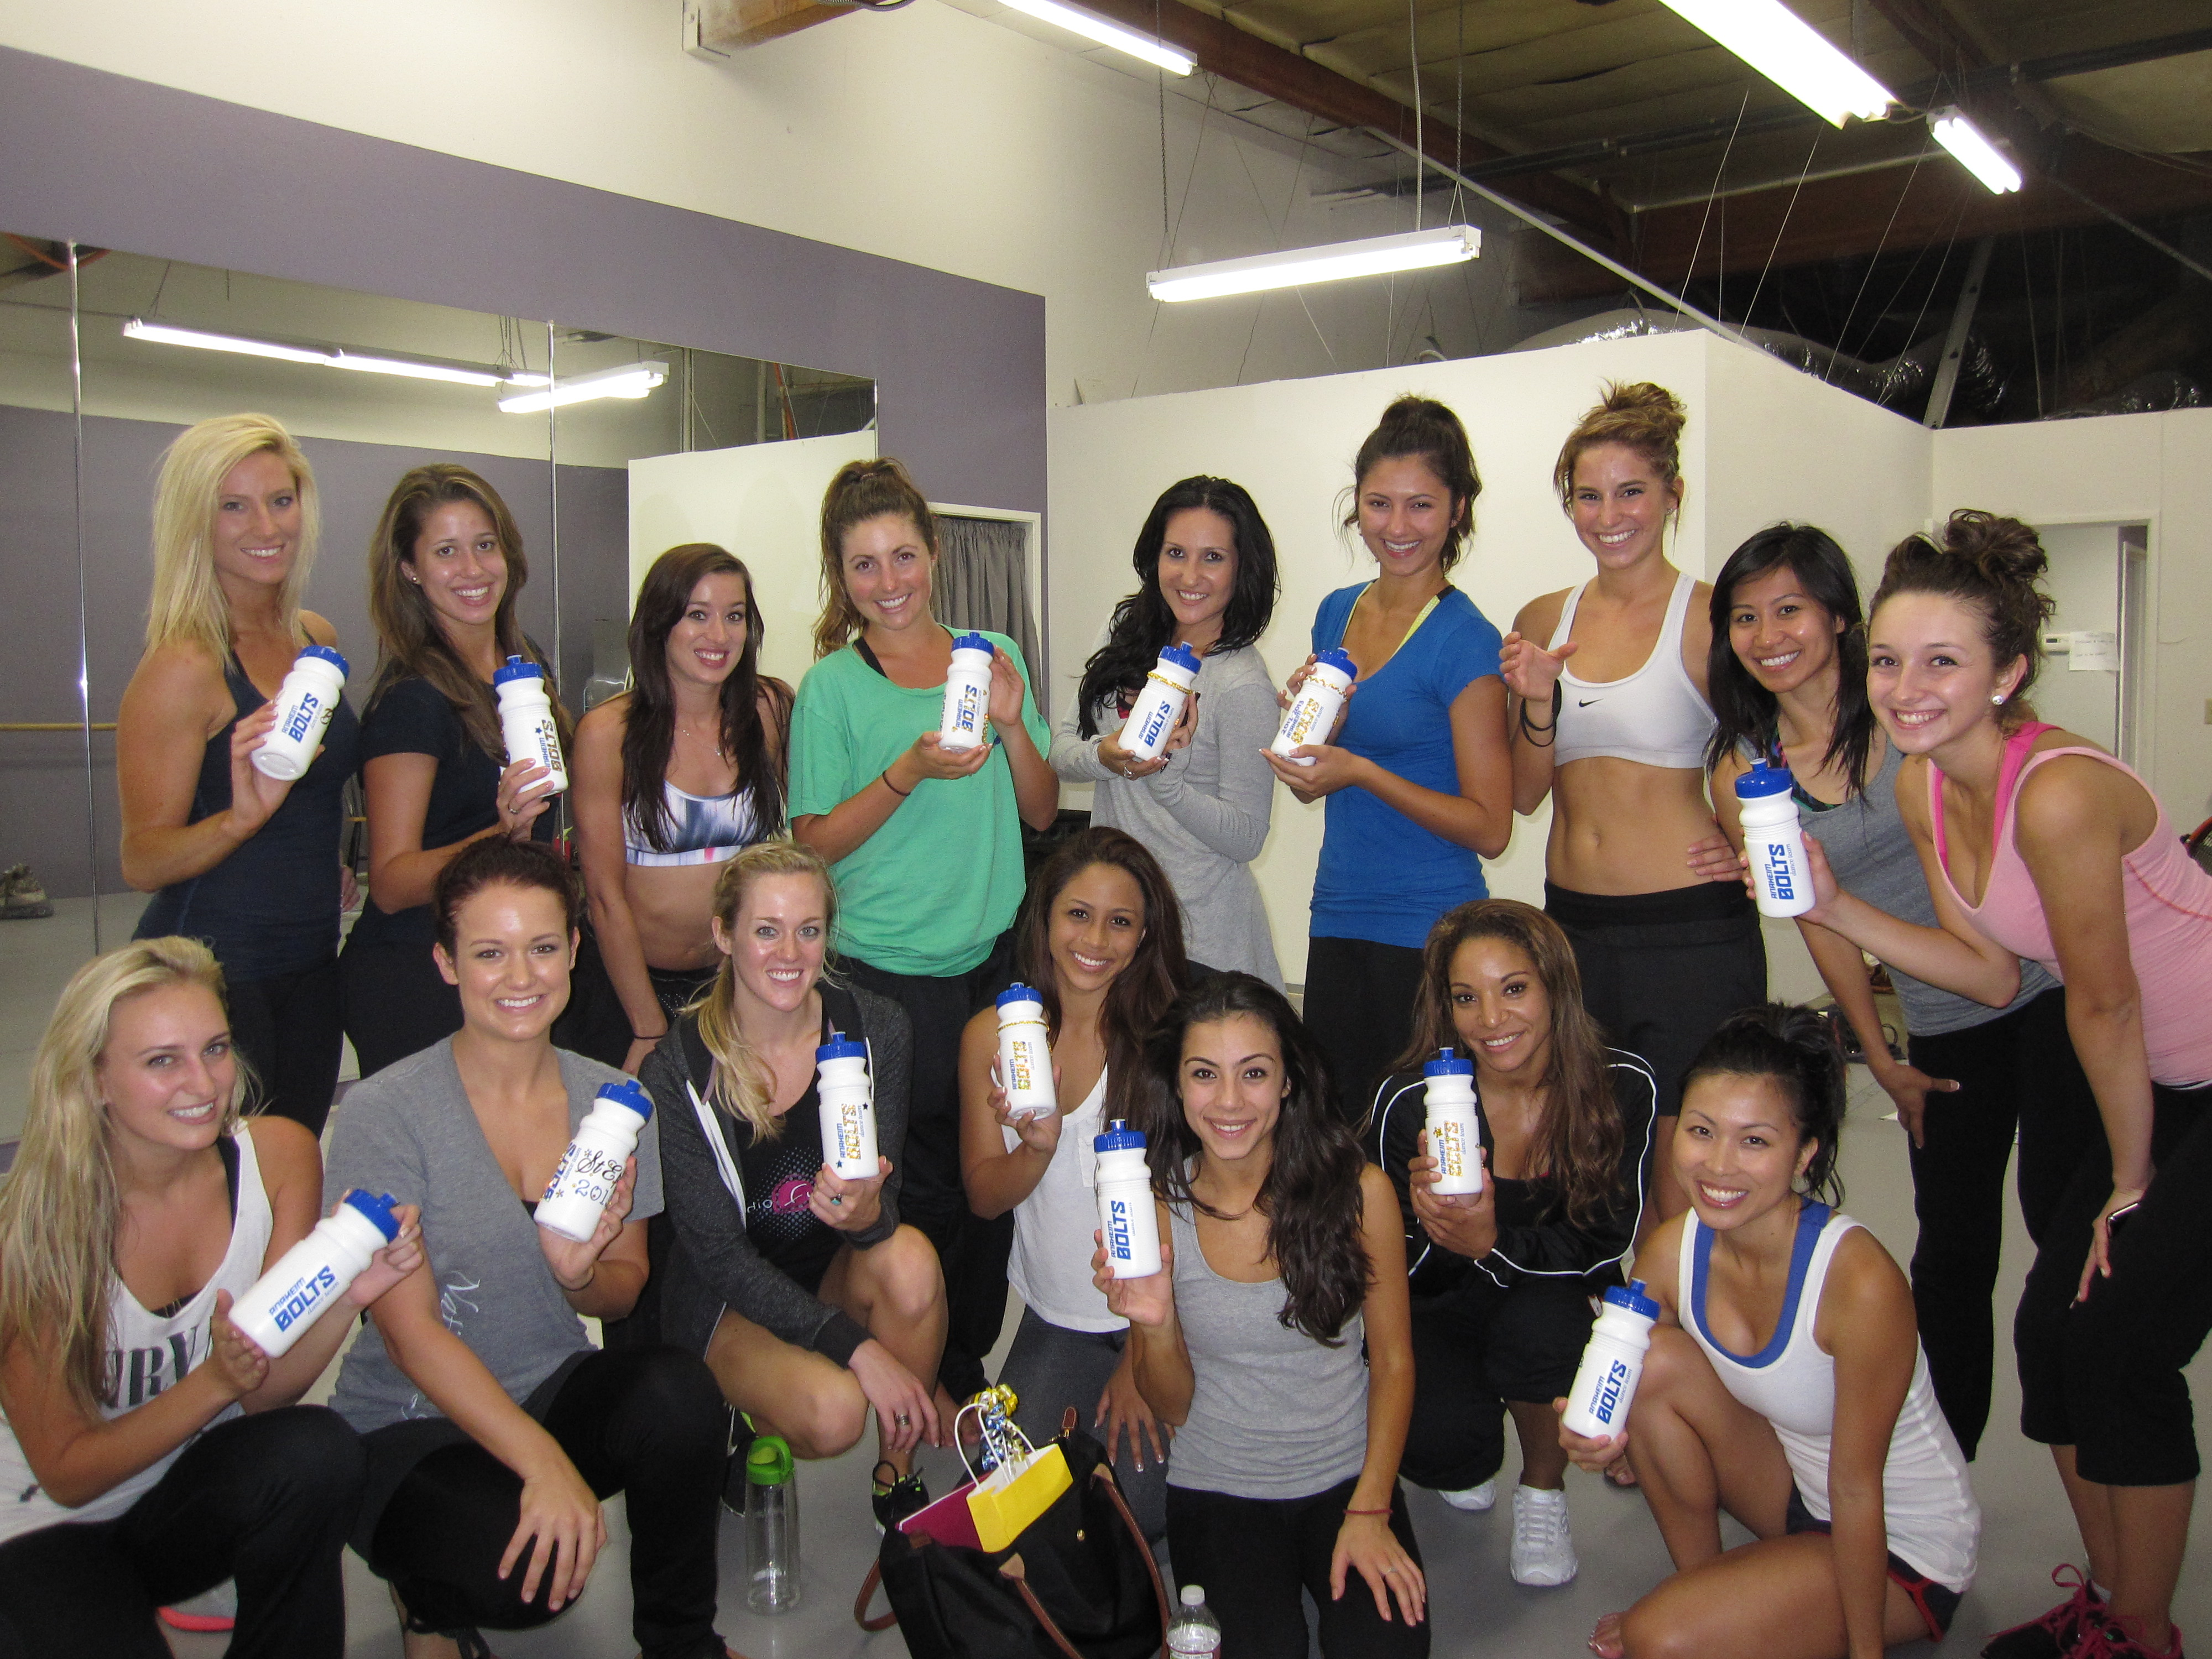 Anaheim Bolts Professional Dance Team